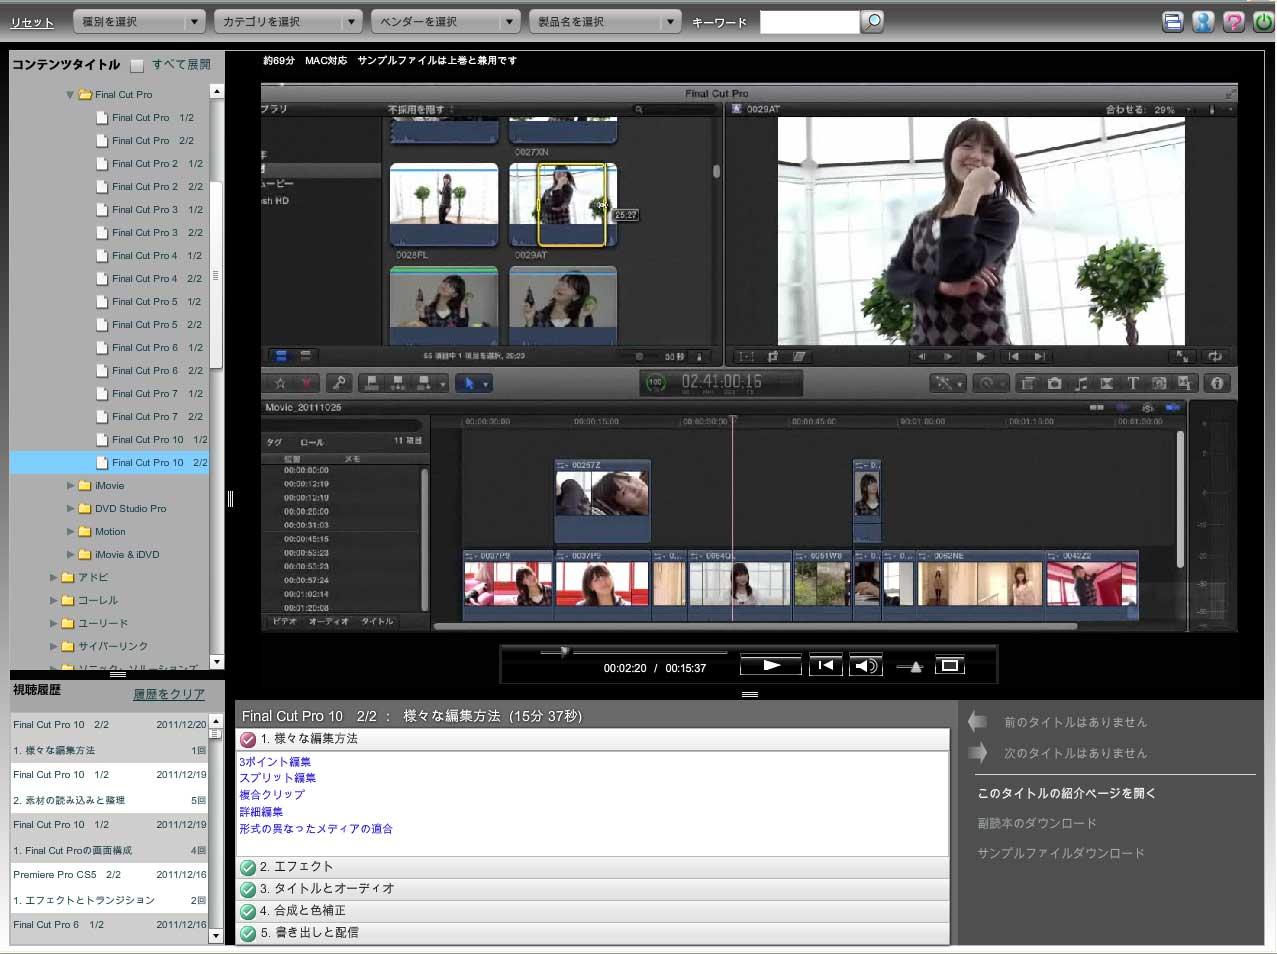 eラーニング『Final Cut Pro X 使い方講座』(全2巻)を動学.tvに12月27日公開